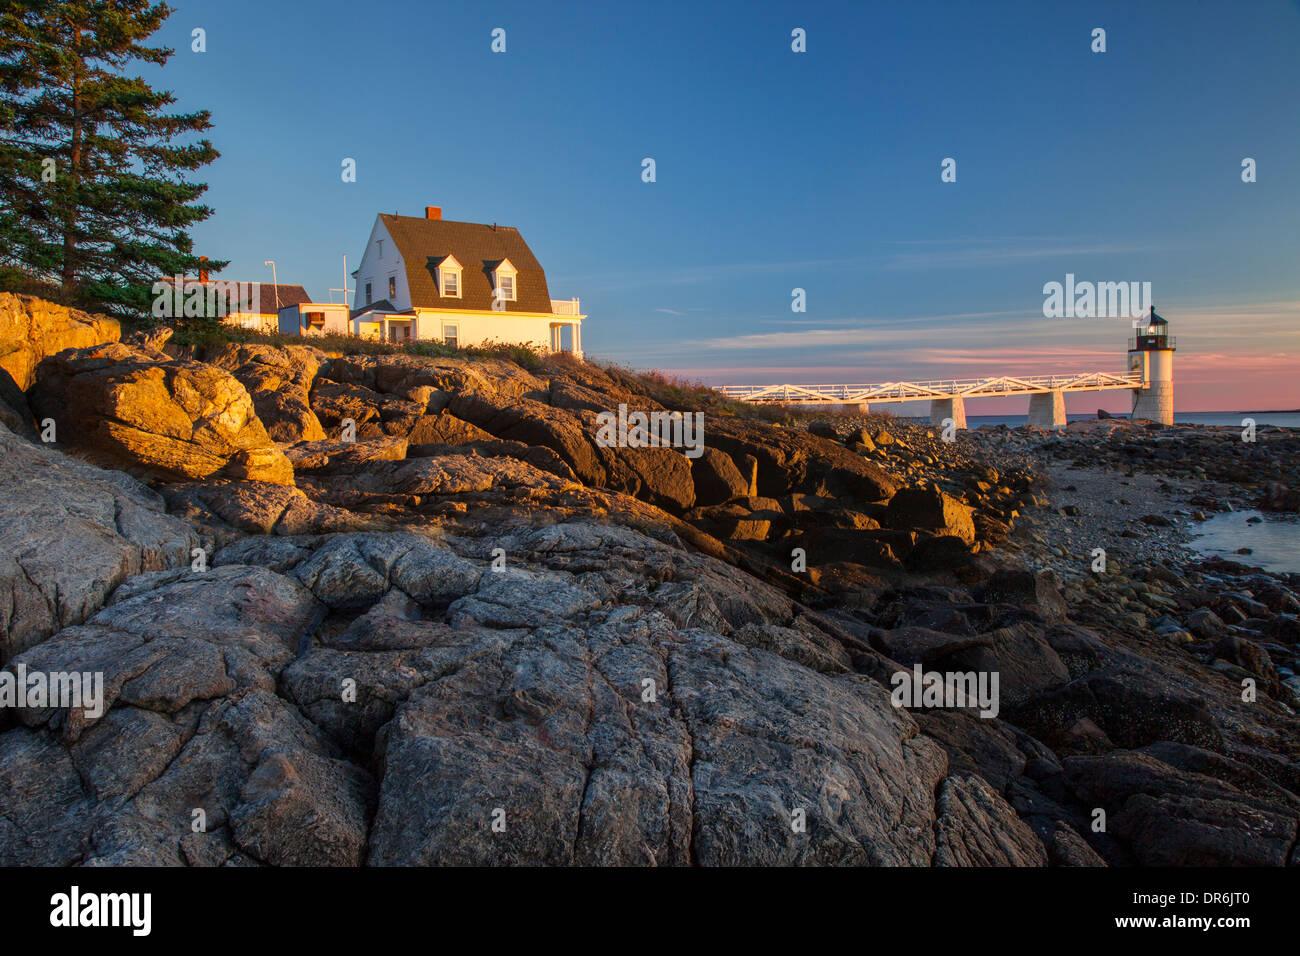 Sunset over Marshall Point Lighthouse near Port Clyde, Maine, USA - Stock Image